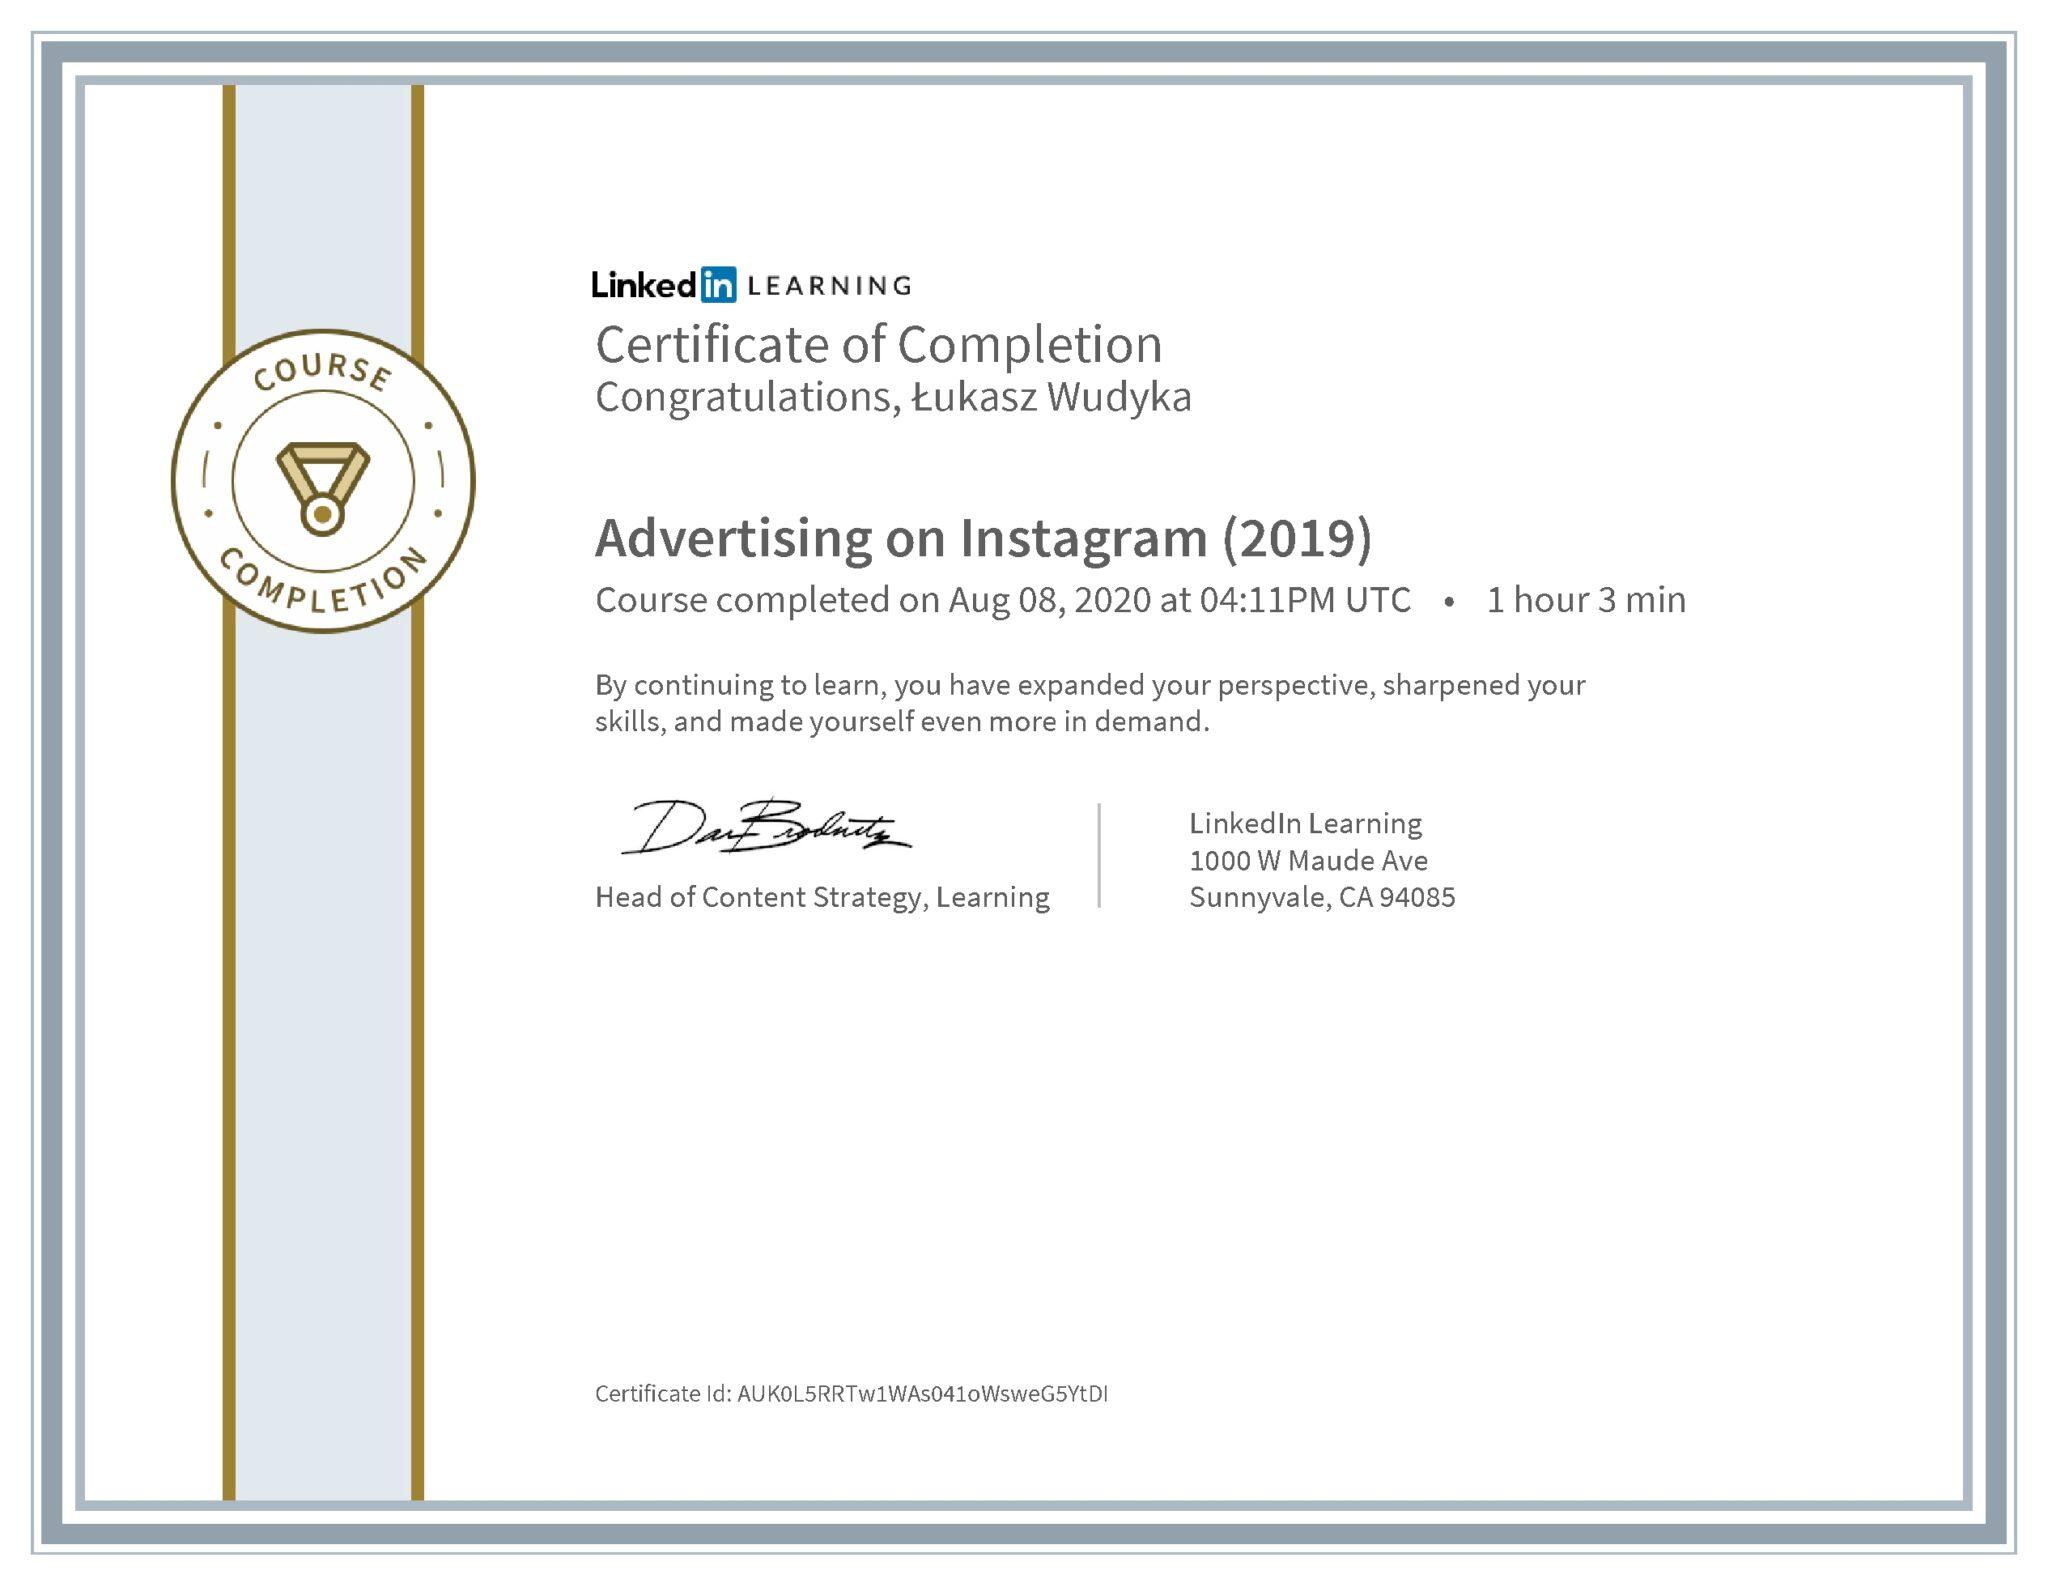 Łukasz Wudyka certyfikat LinkedIn Advertising on Instagram (2019)